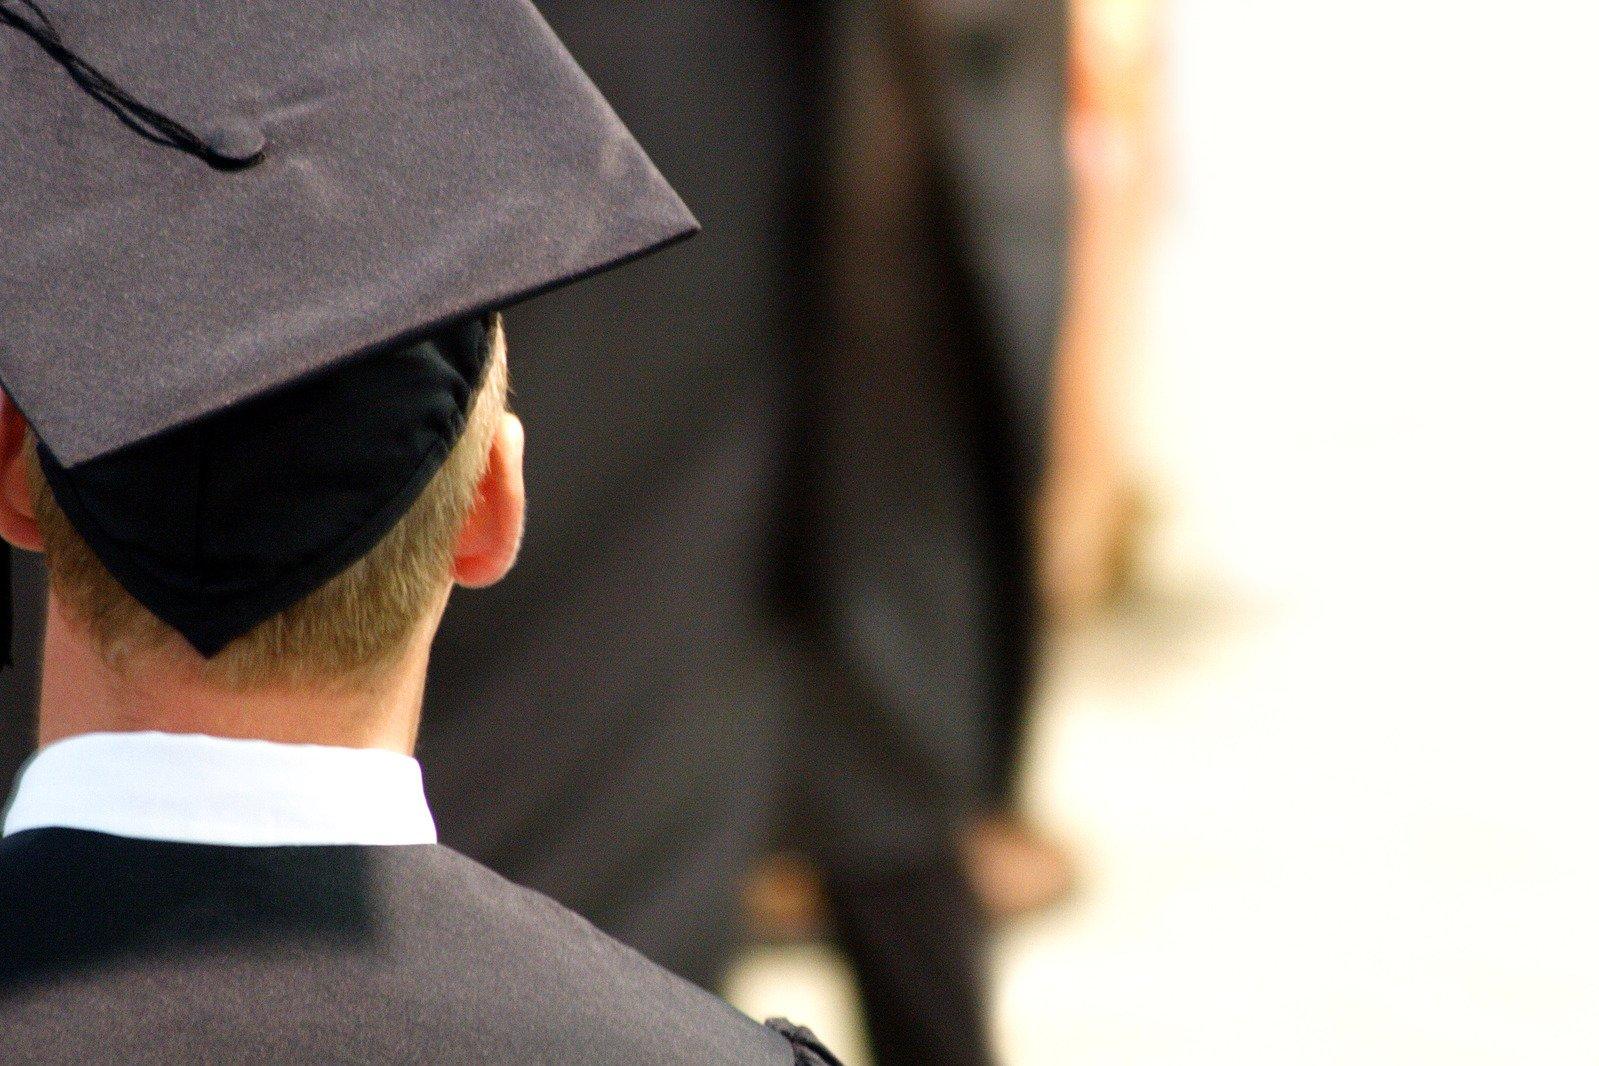 absolvent v taláru